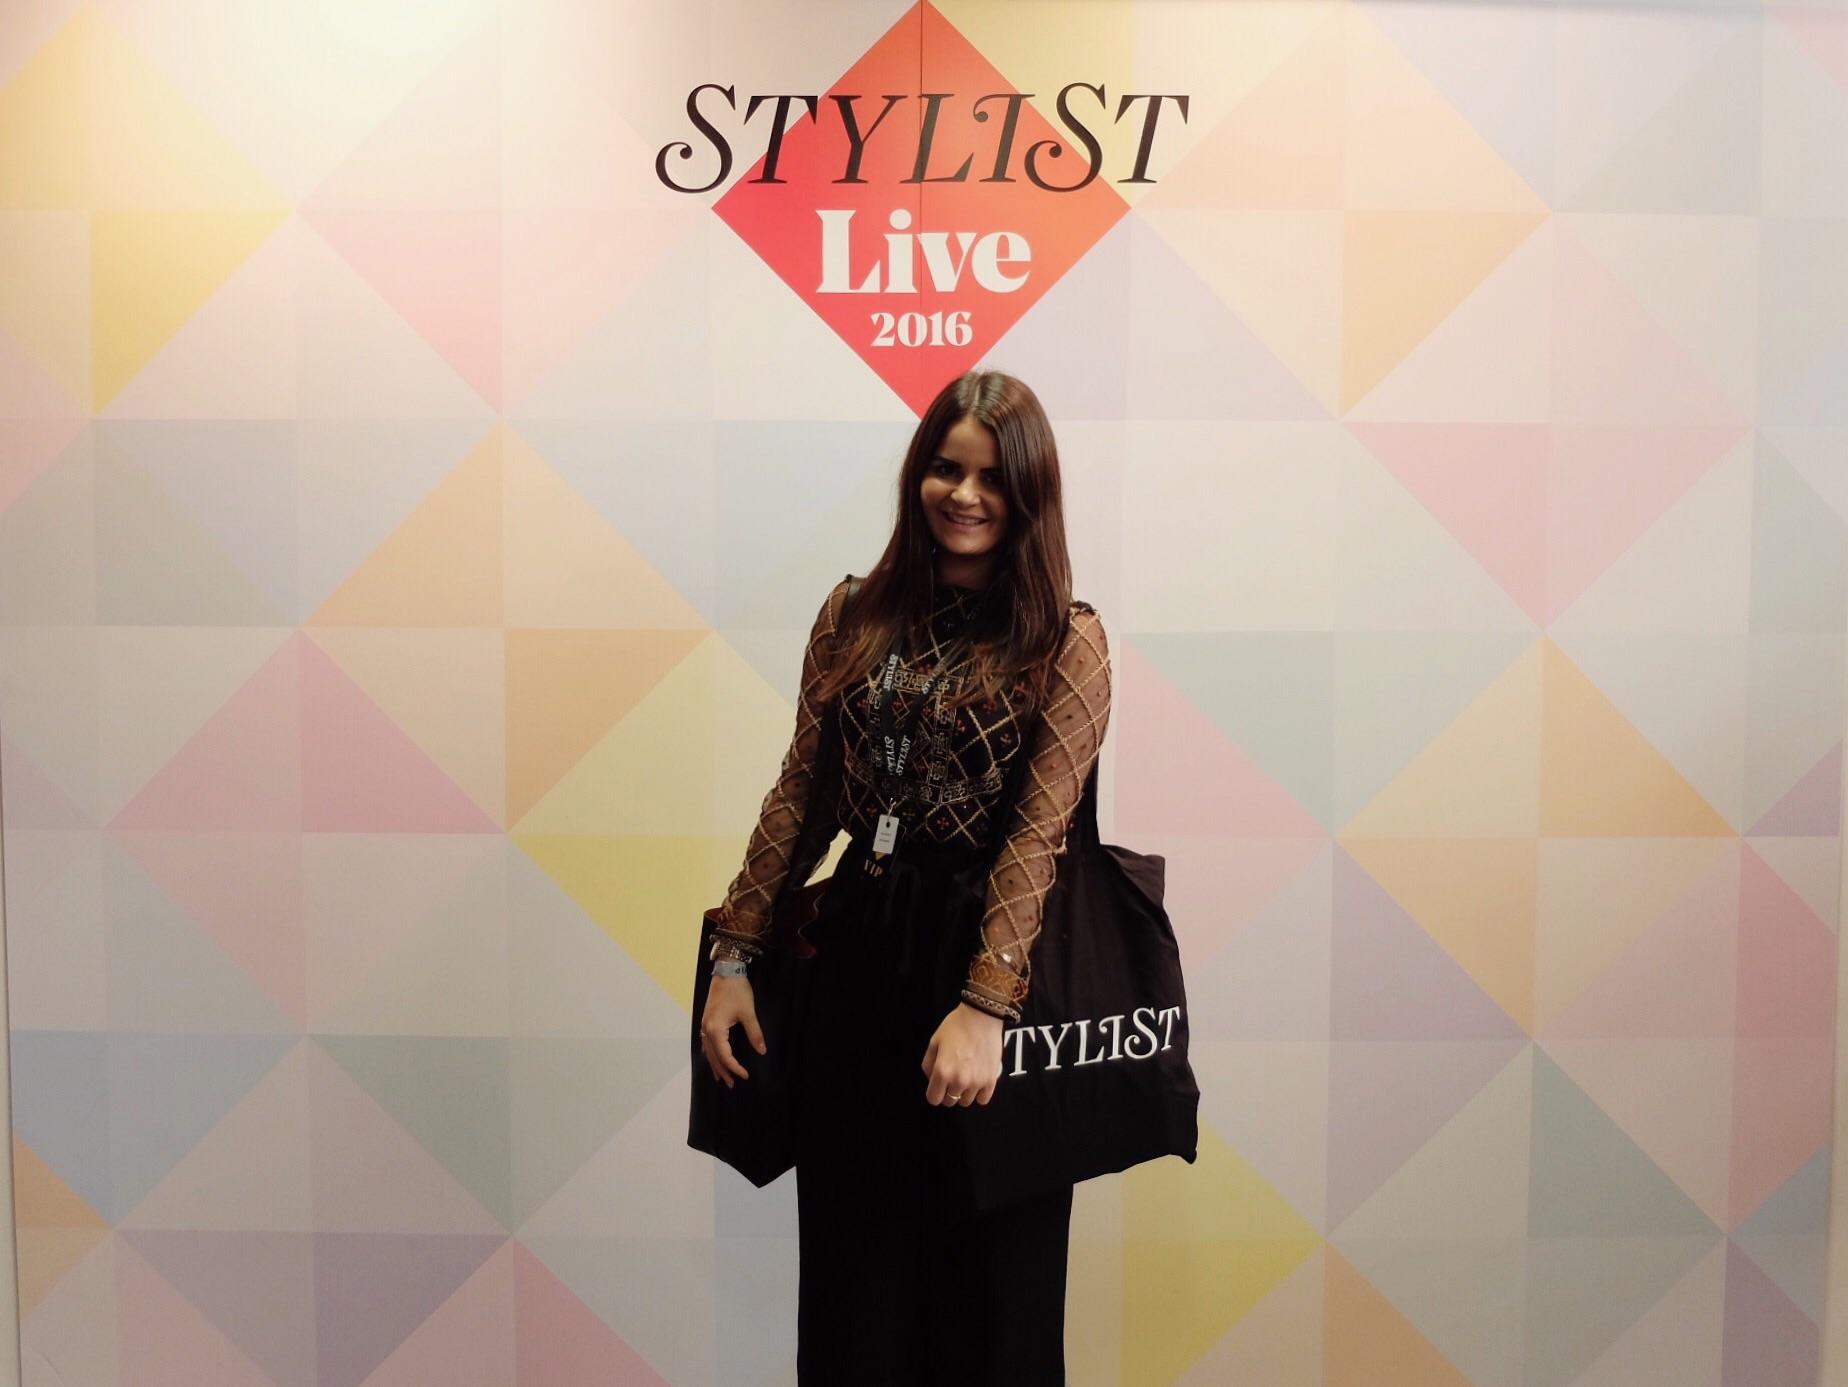 Stylist_Live_blogger_Review